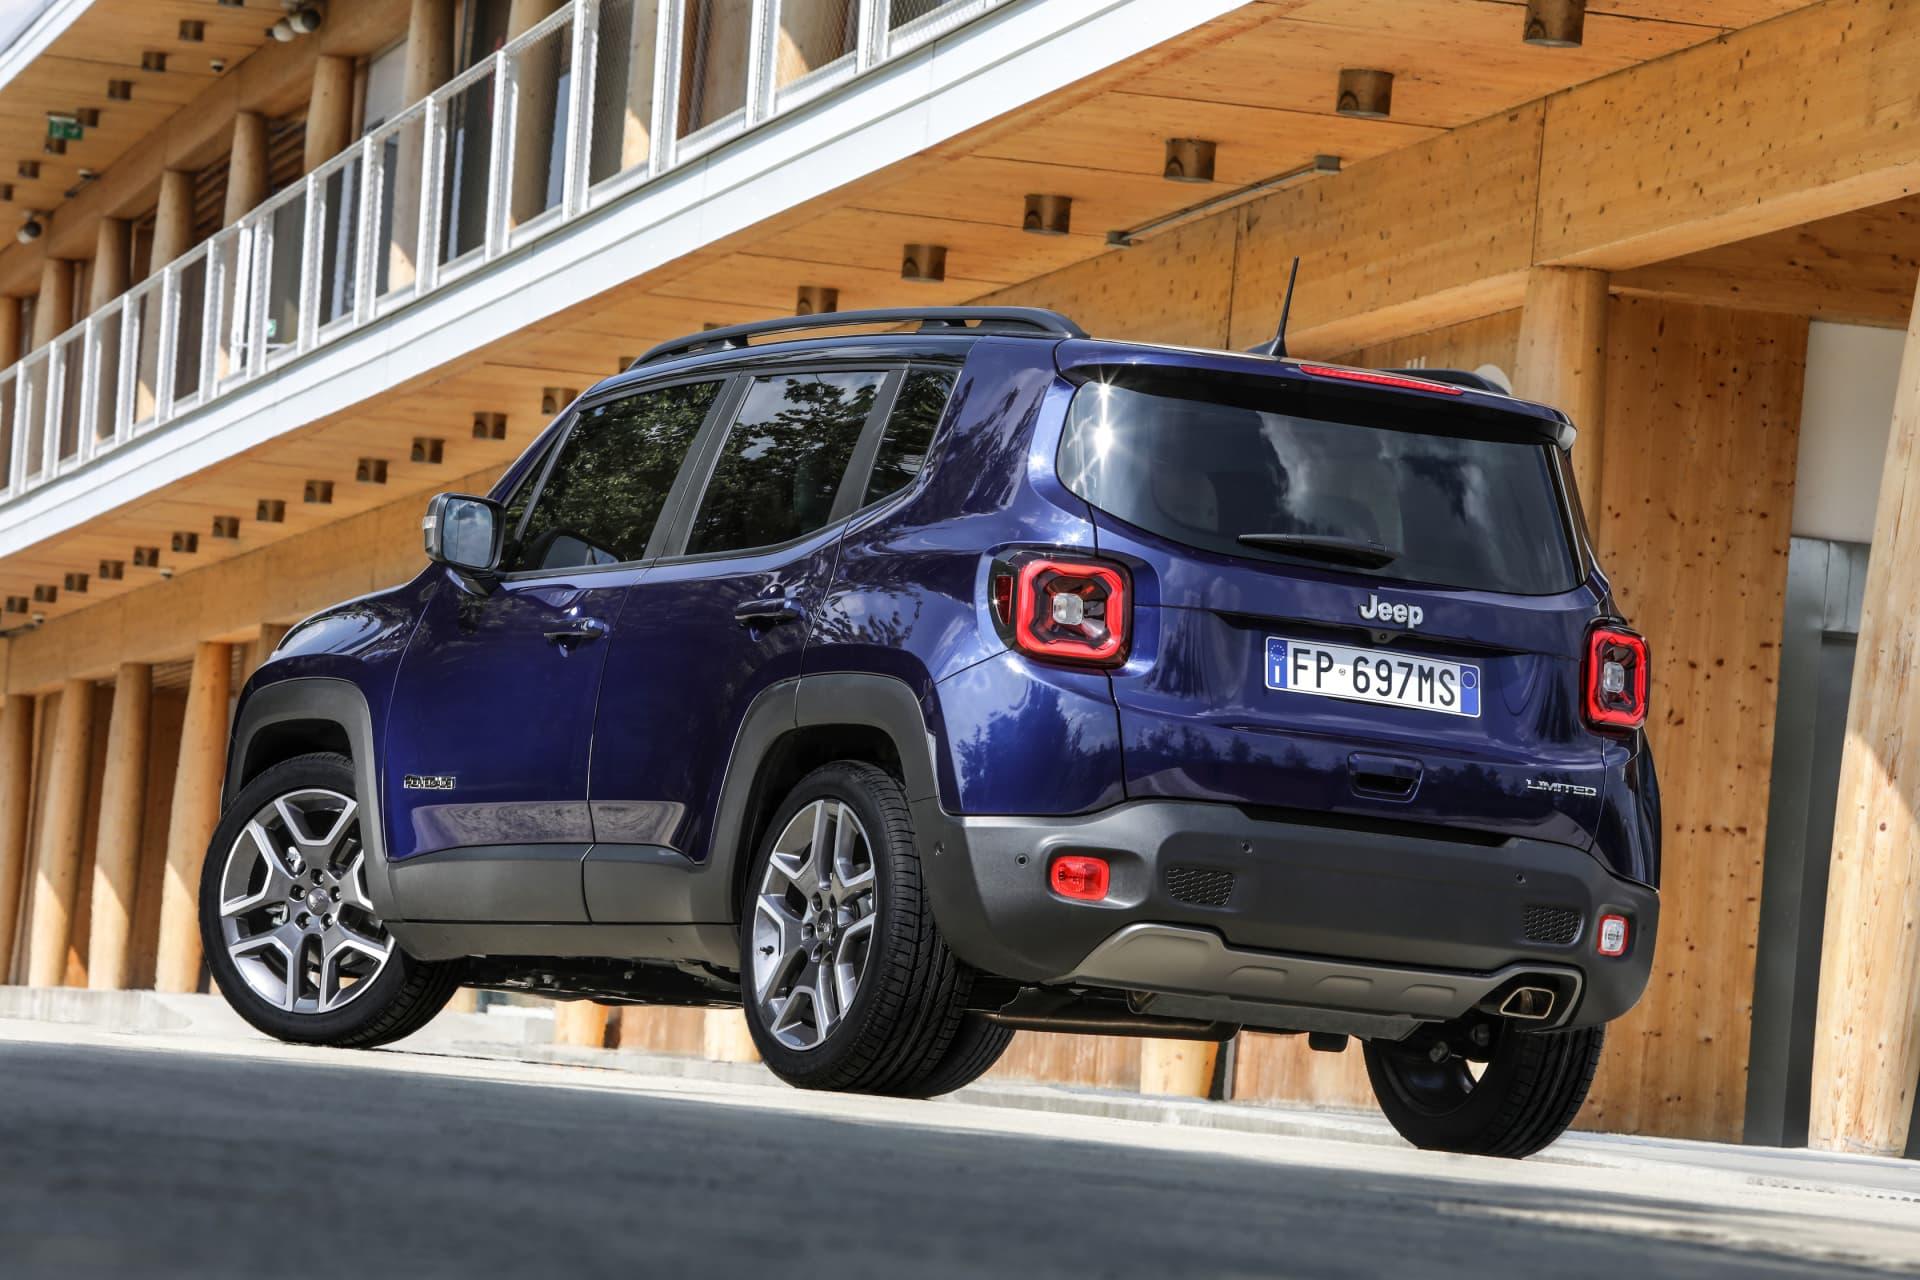 Jeep Renegade Oferta Enero 2021 04